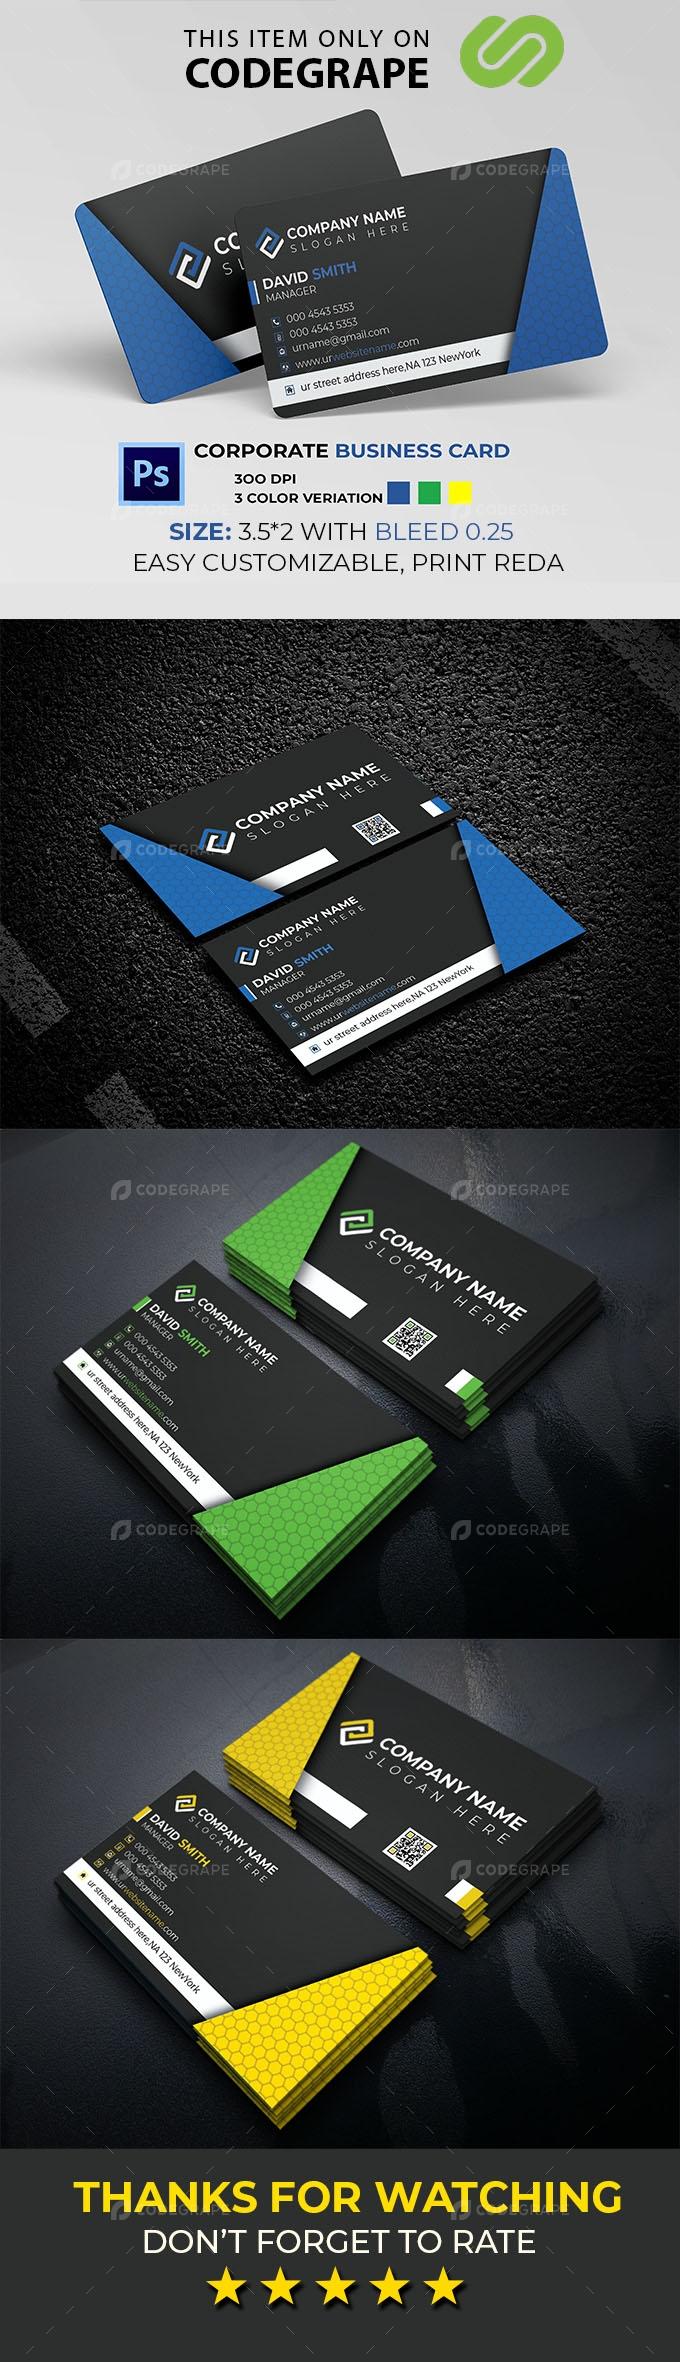 Corporate_Business_Card